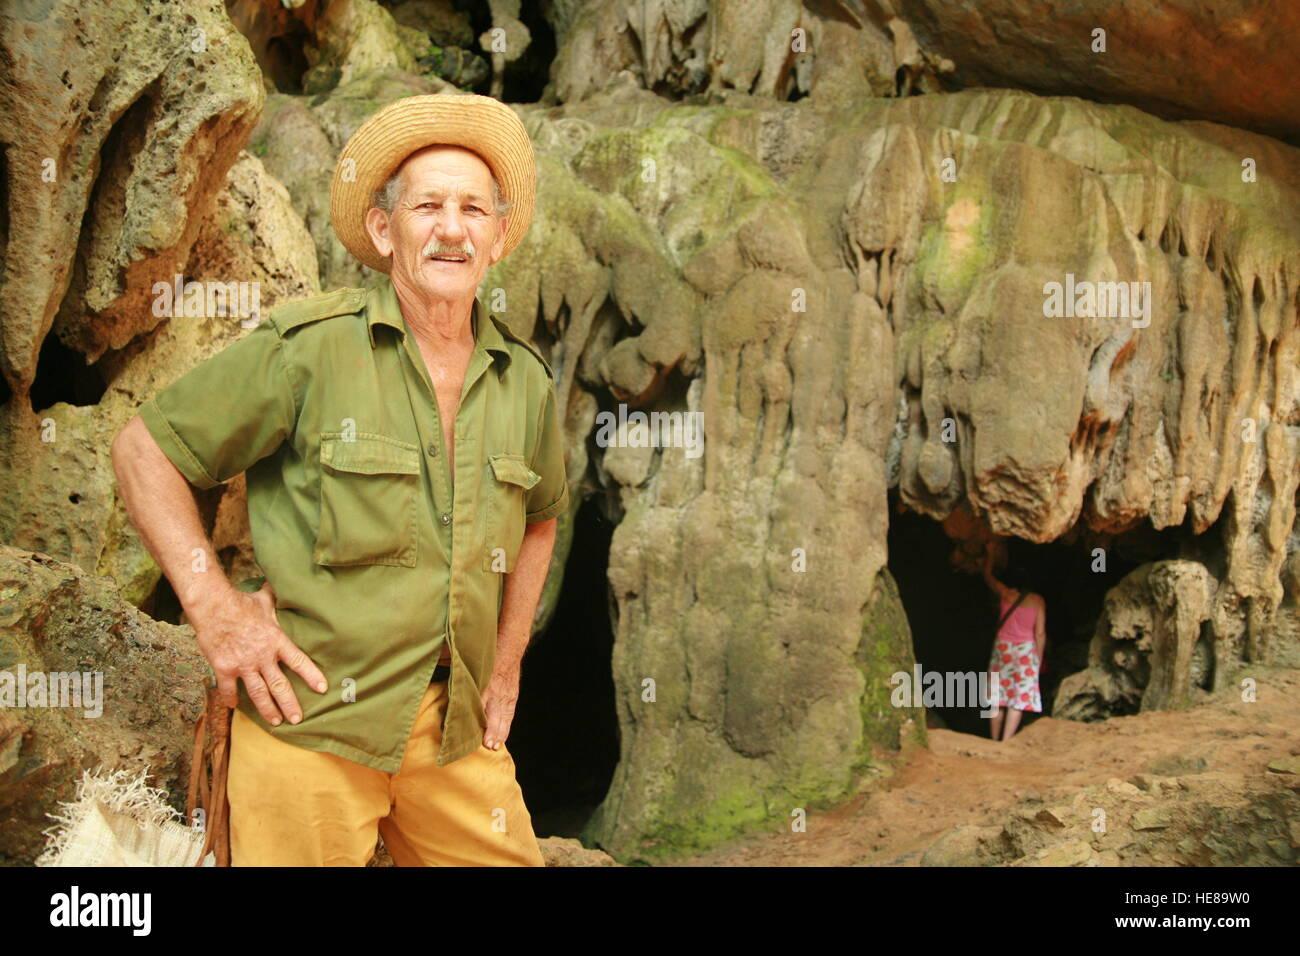 Vinales Cave Stockfotos & Vinales Cave Bilder - Alamy